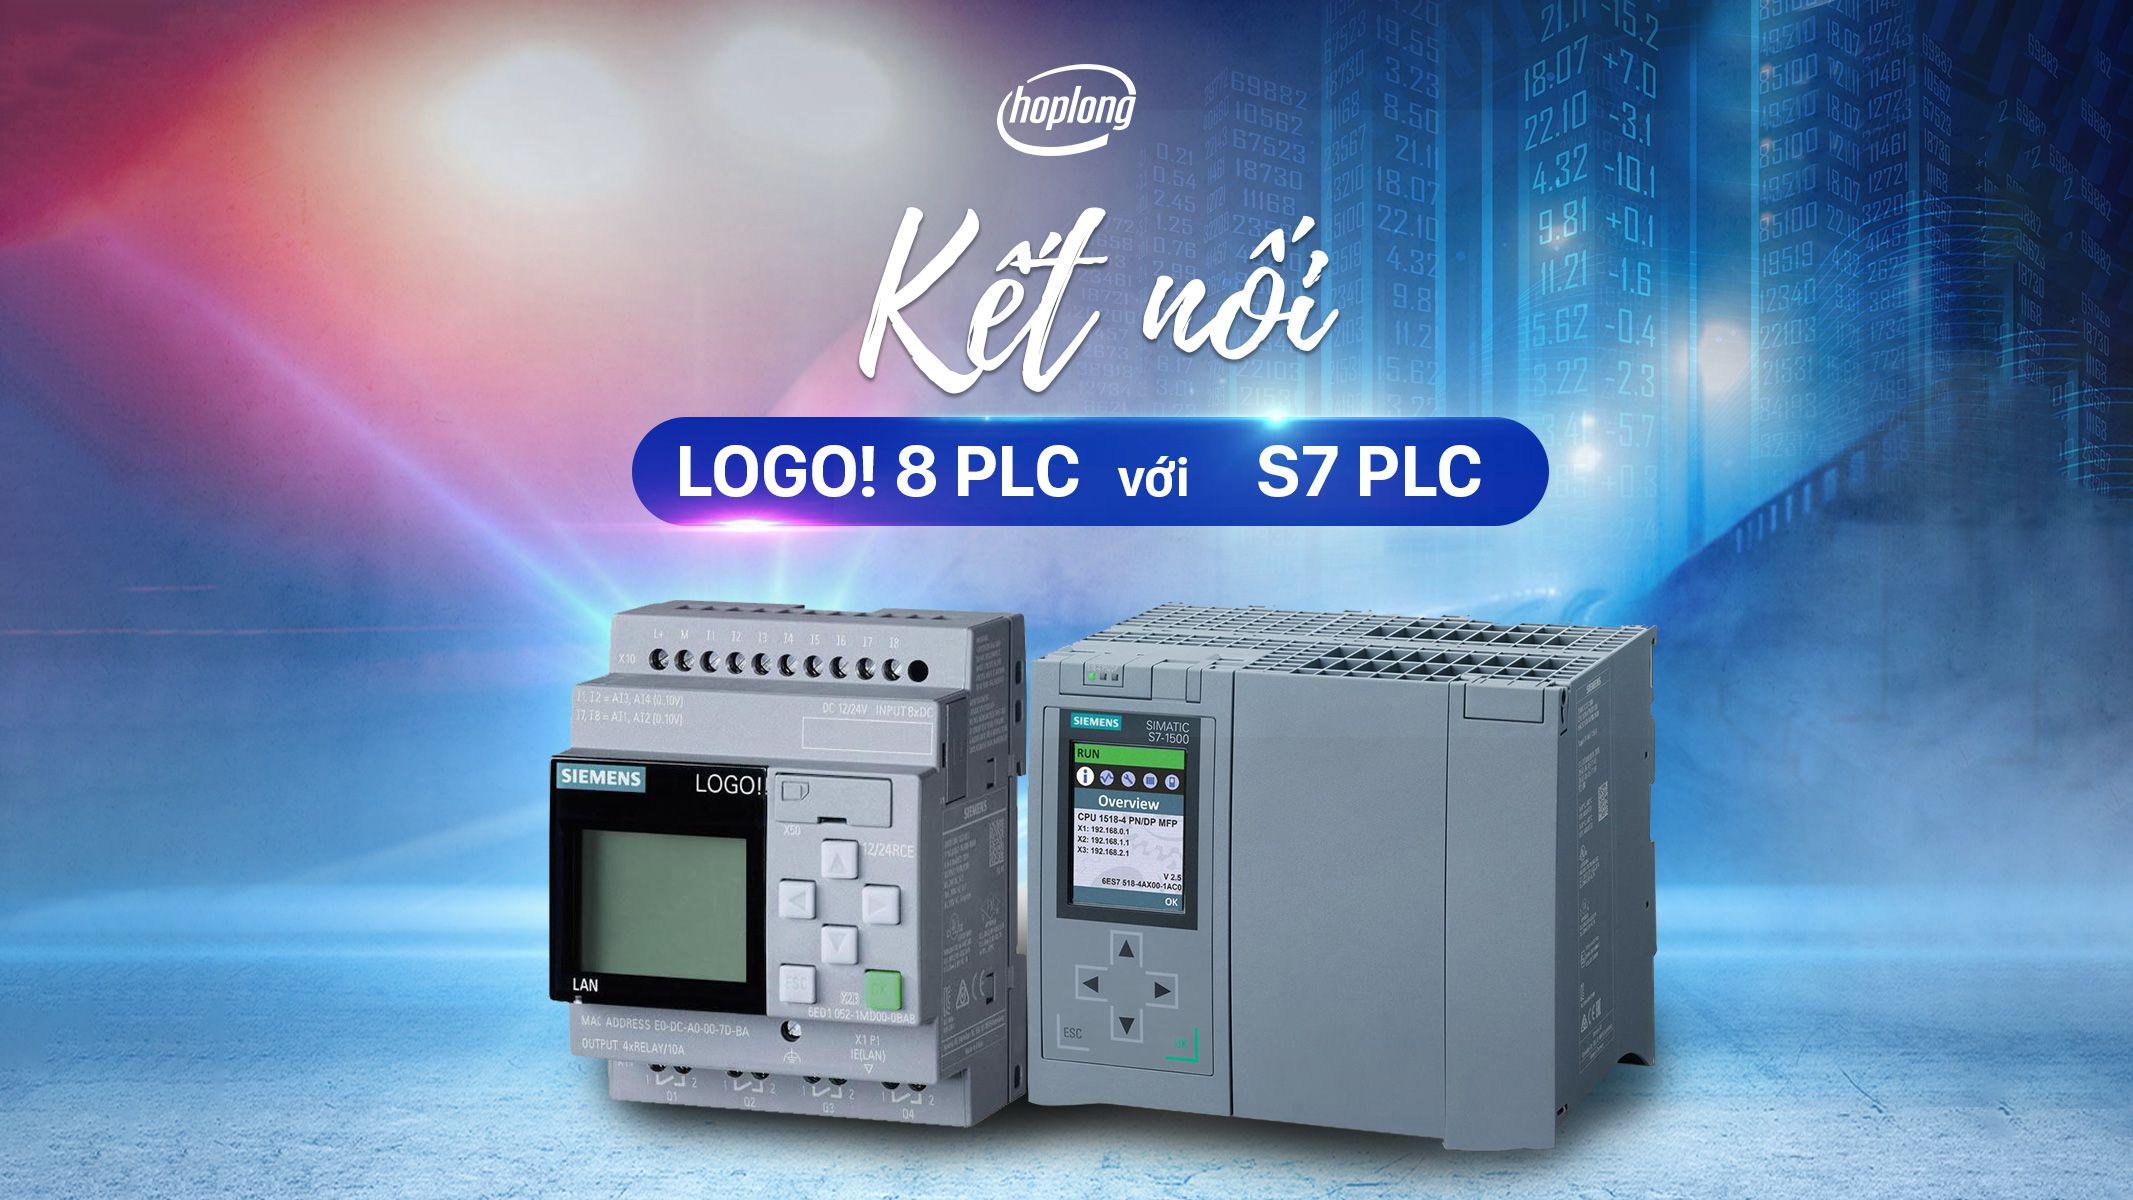 Cách kết nối LOGO! 8 PLC Siemens với S7 PLC